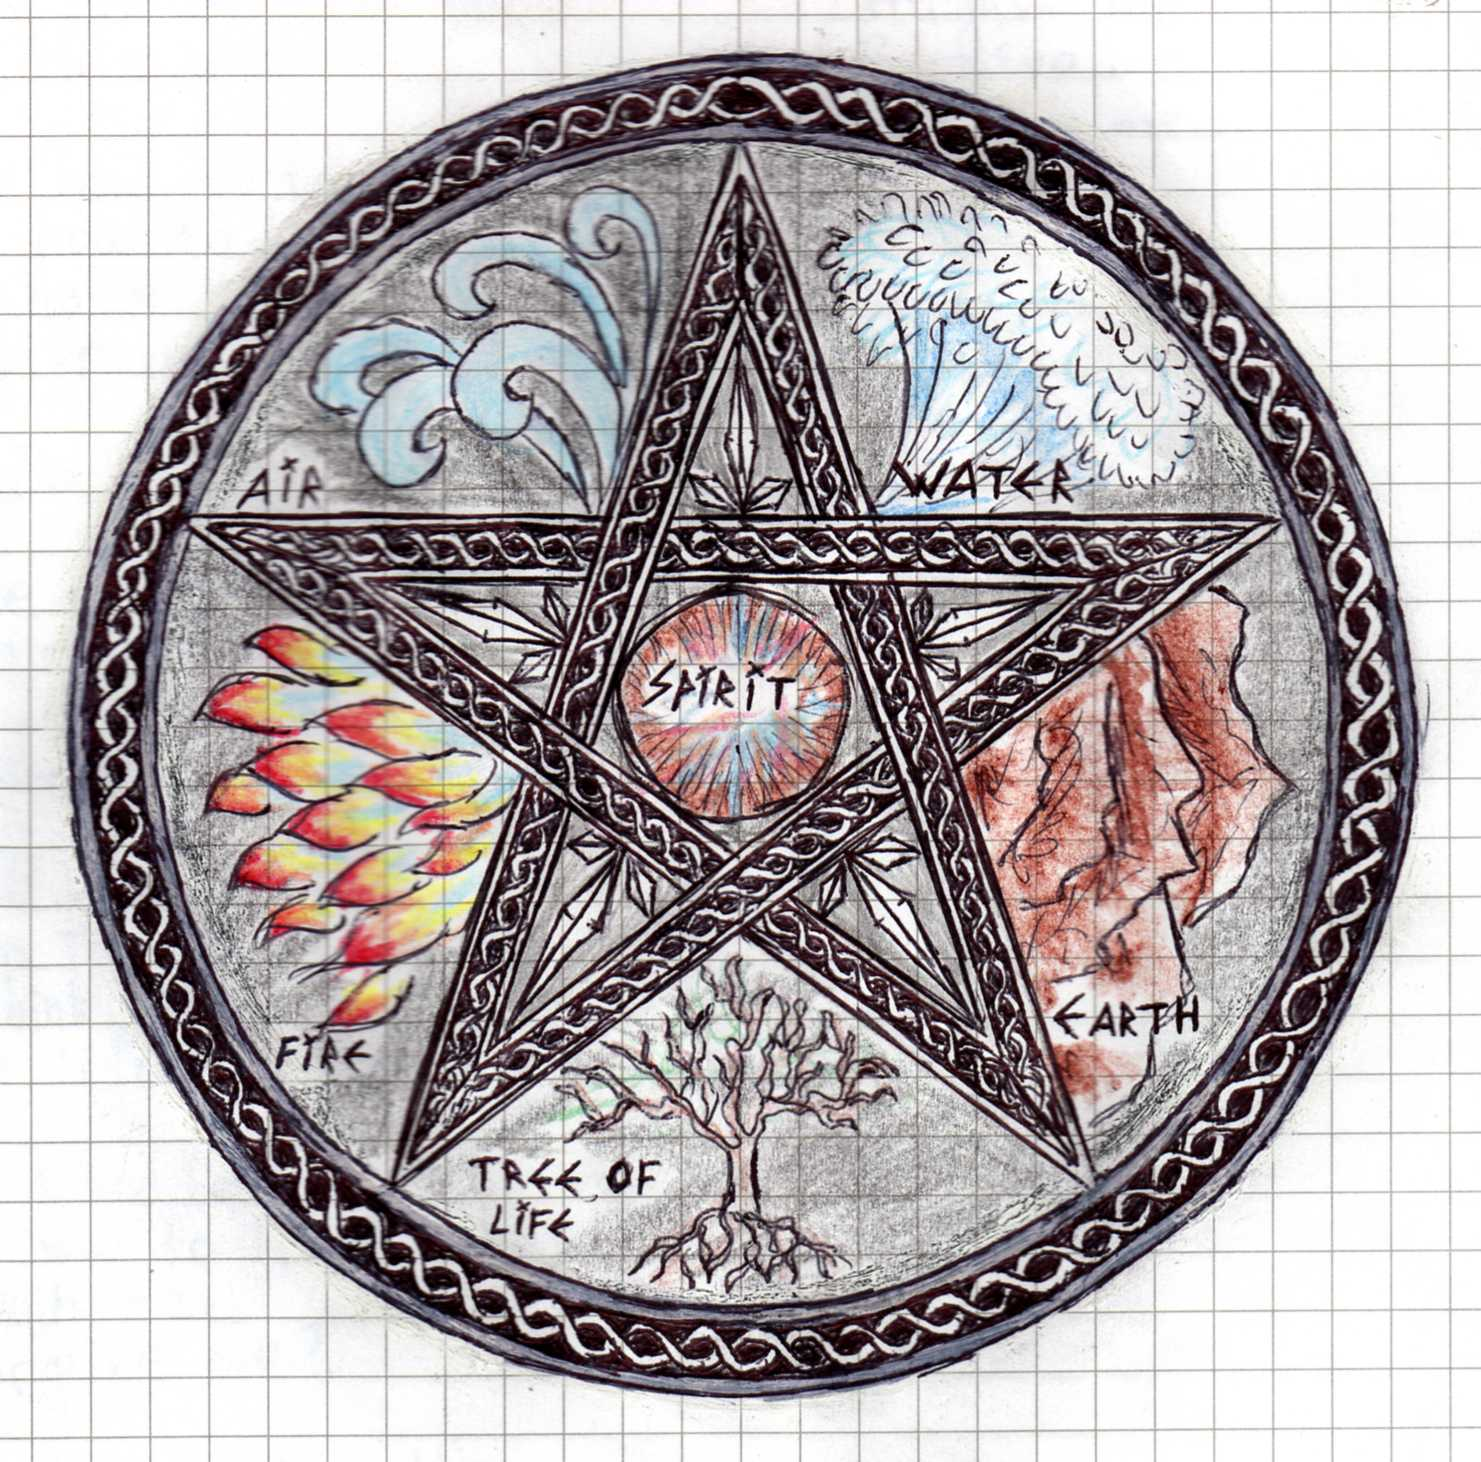 pentagram lmentaire wiccan Wallpaper   ForWallpapercom 1481x1462